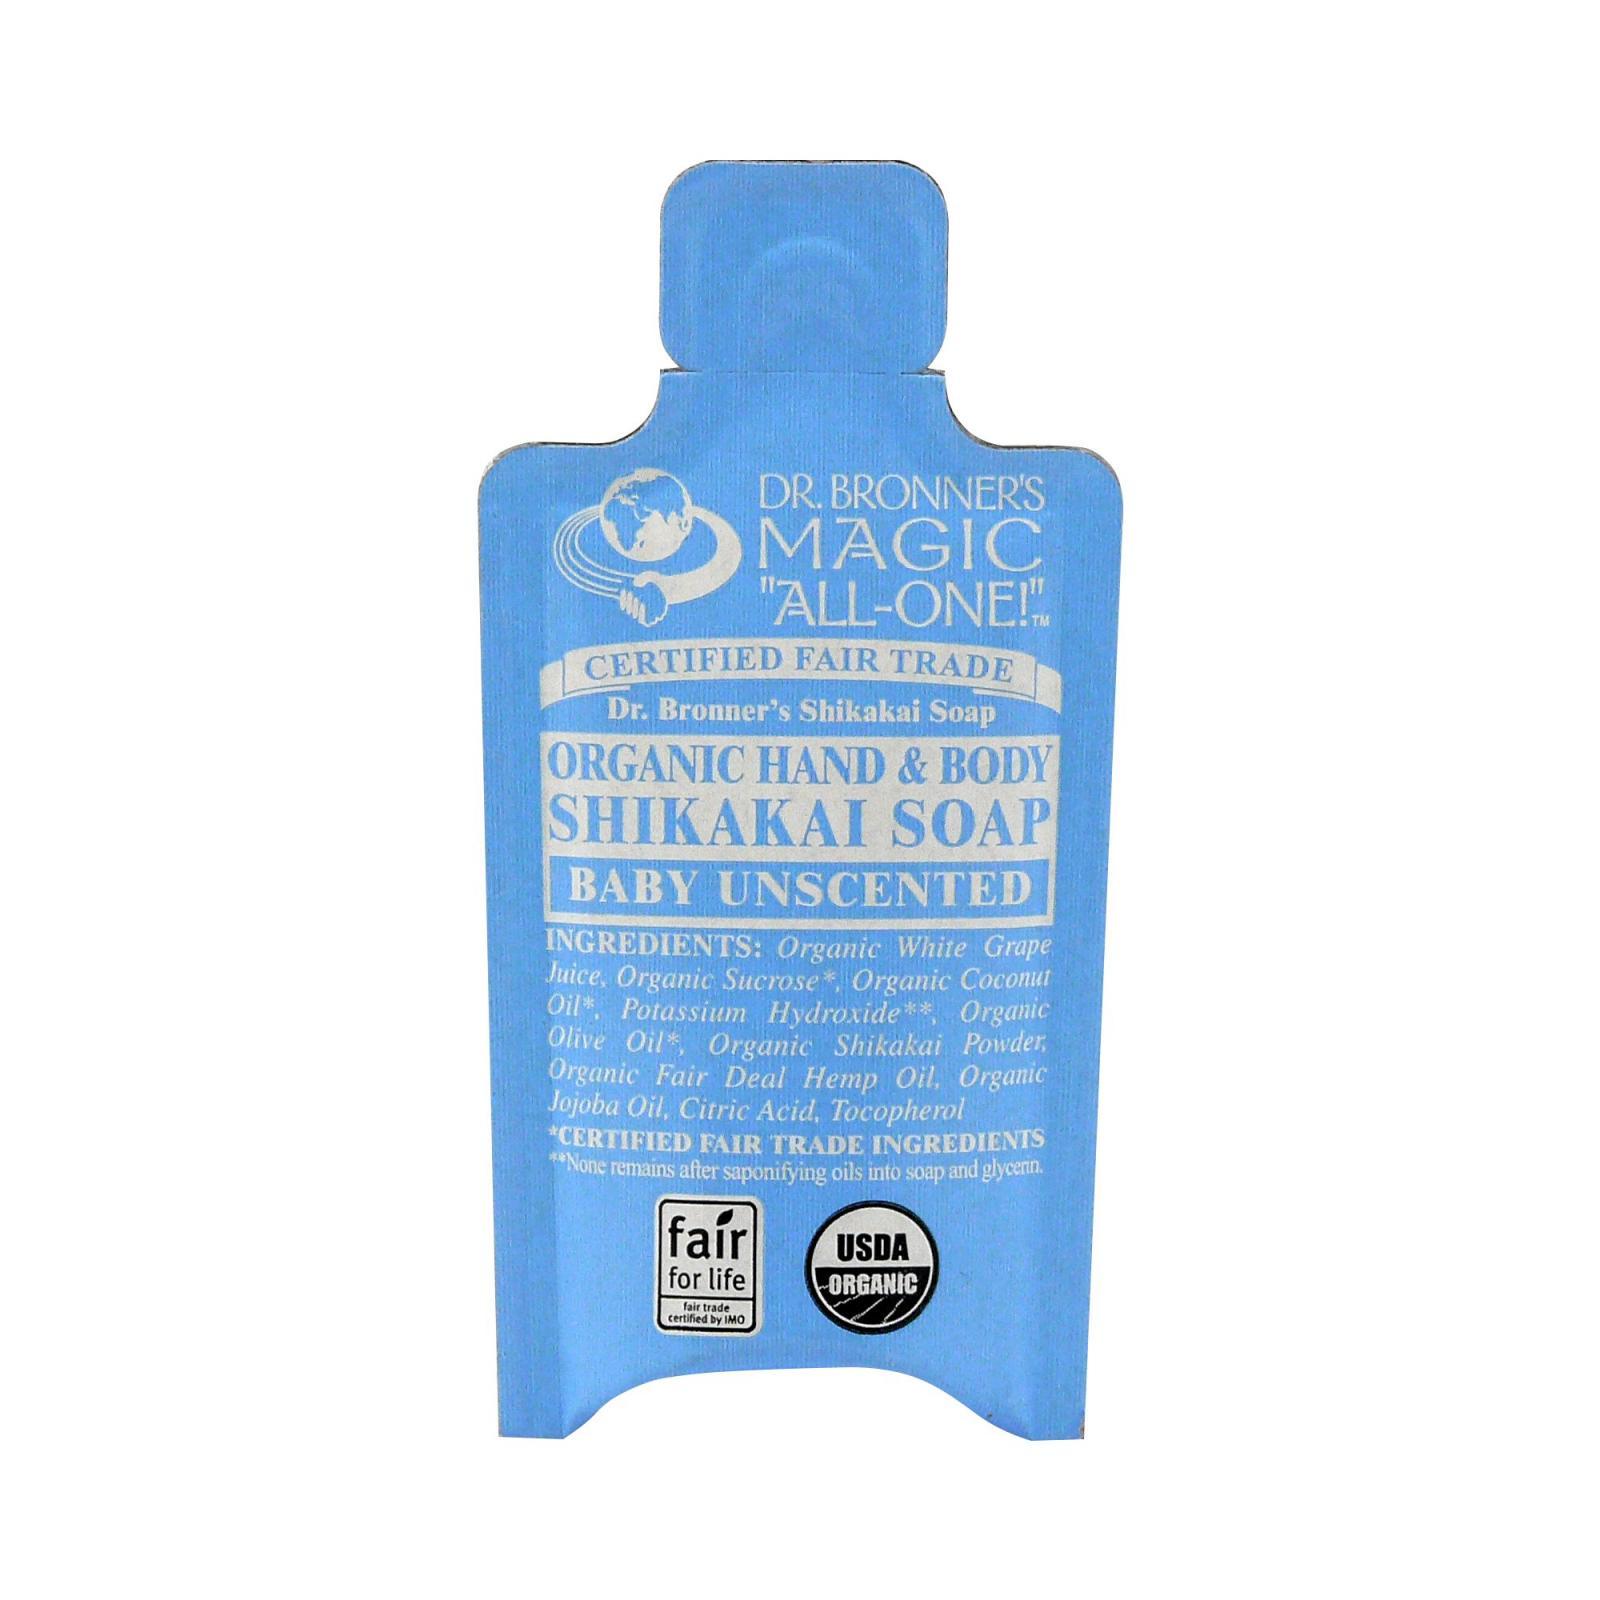 Dr. Bronner's Tekuté mýdlo na tělo i vlasy Shikakai, Baby-Mild 10 ml